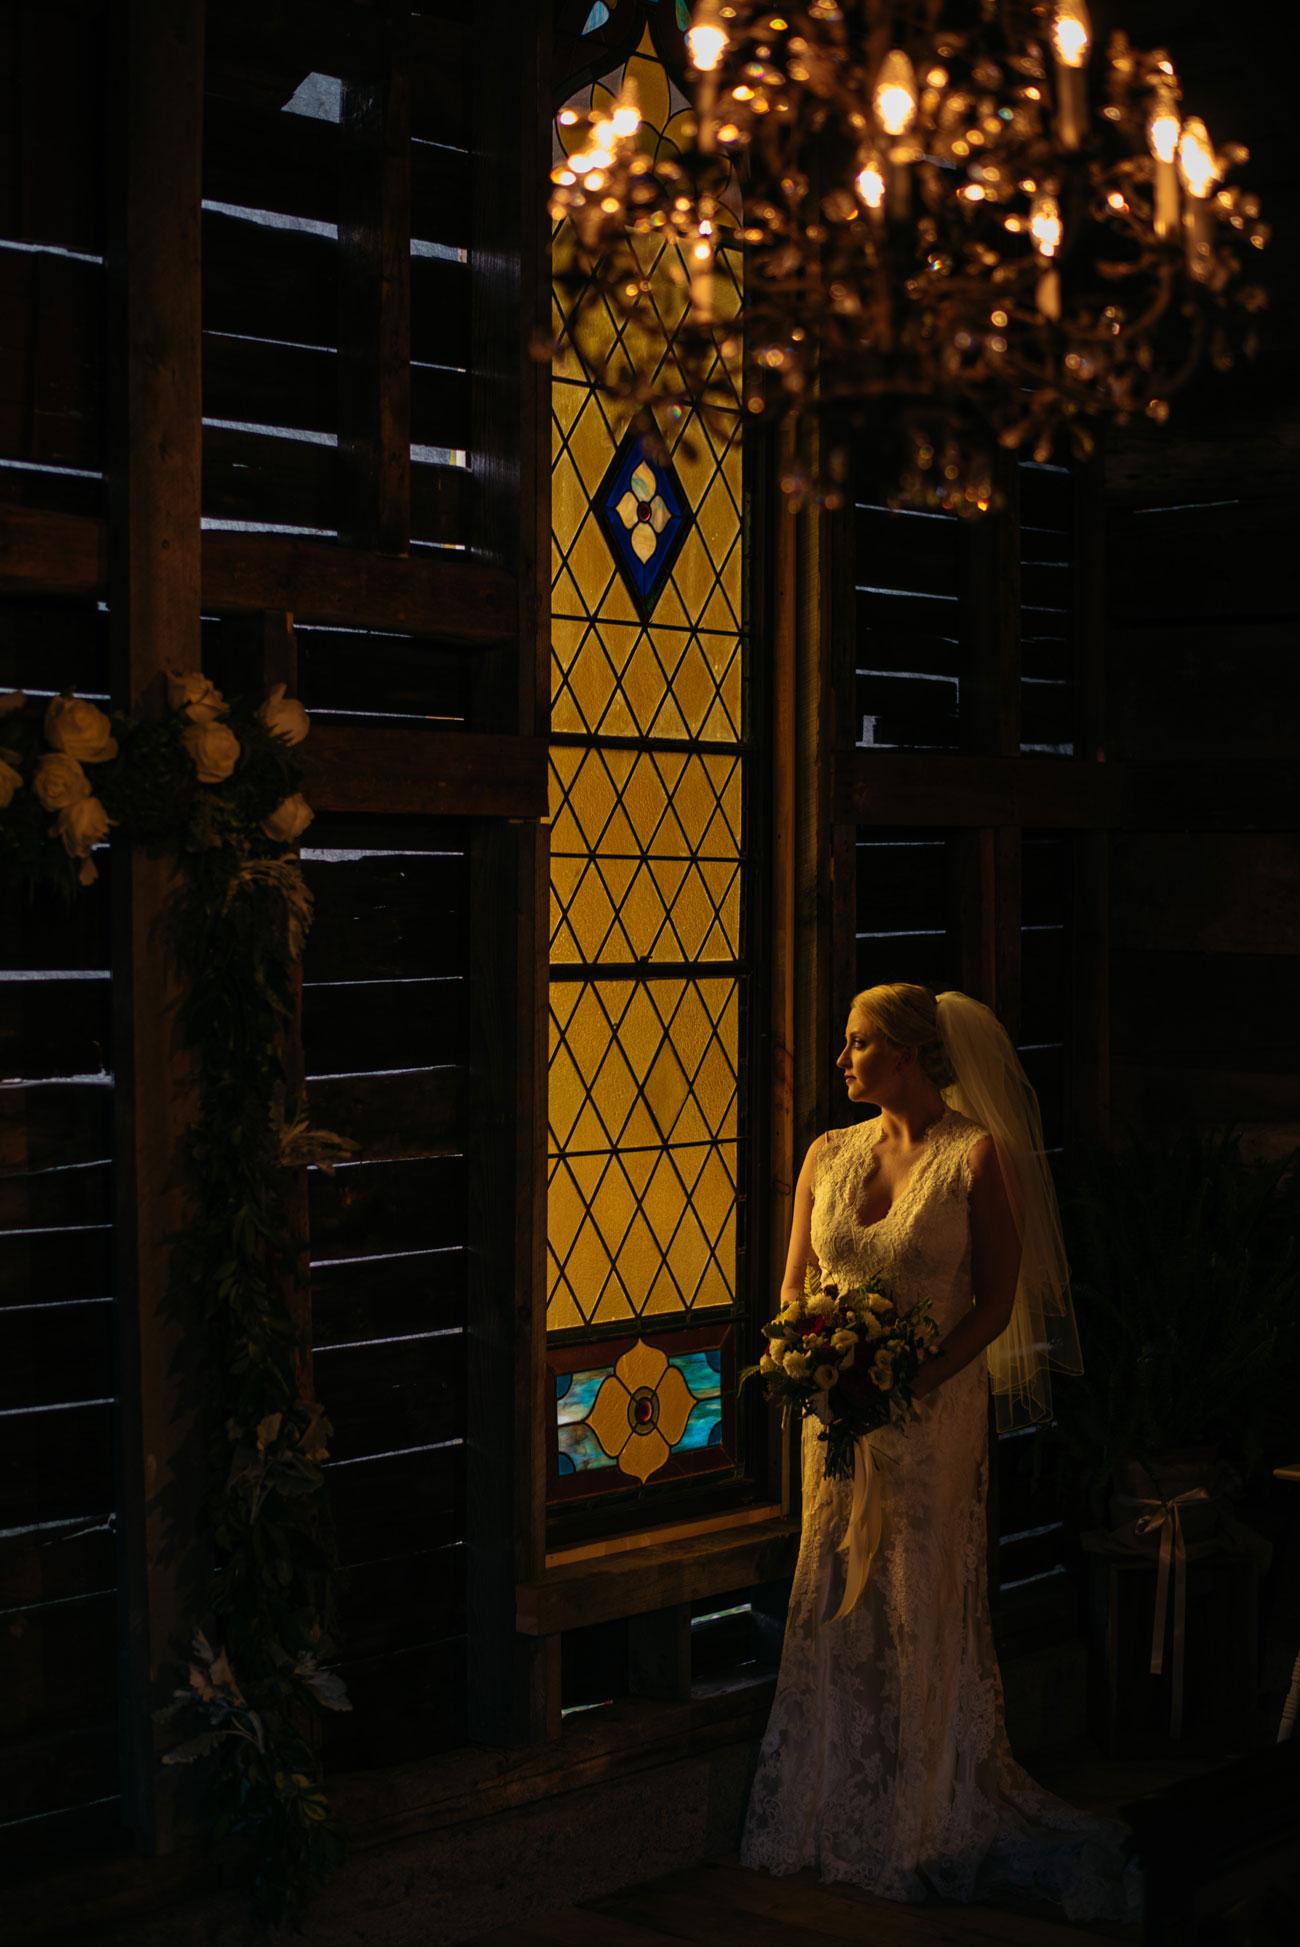 bishop_farm_wedding_photography_36.JPG